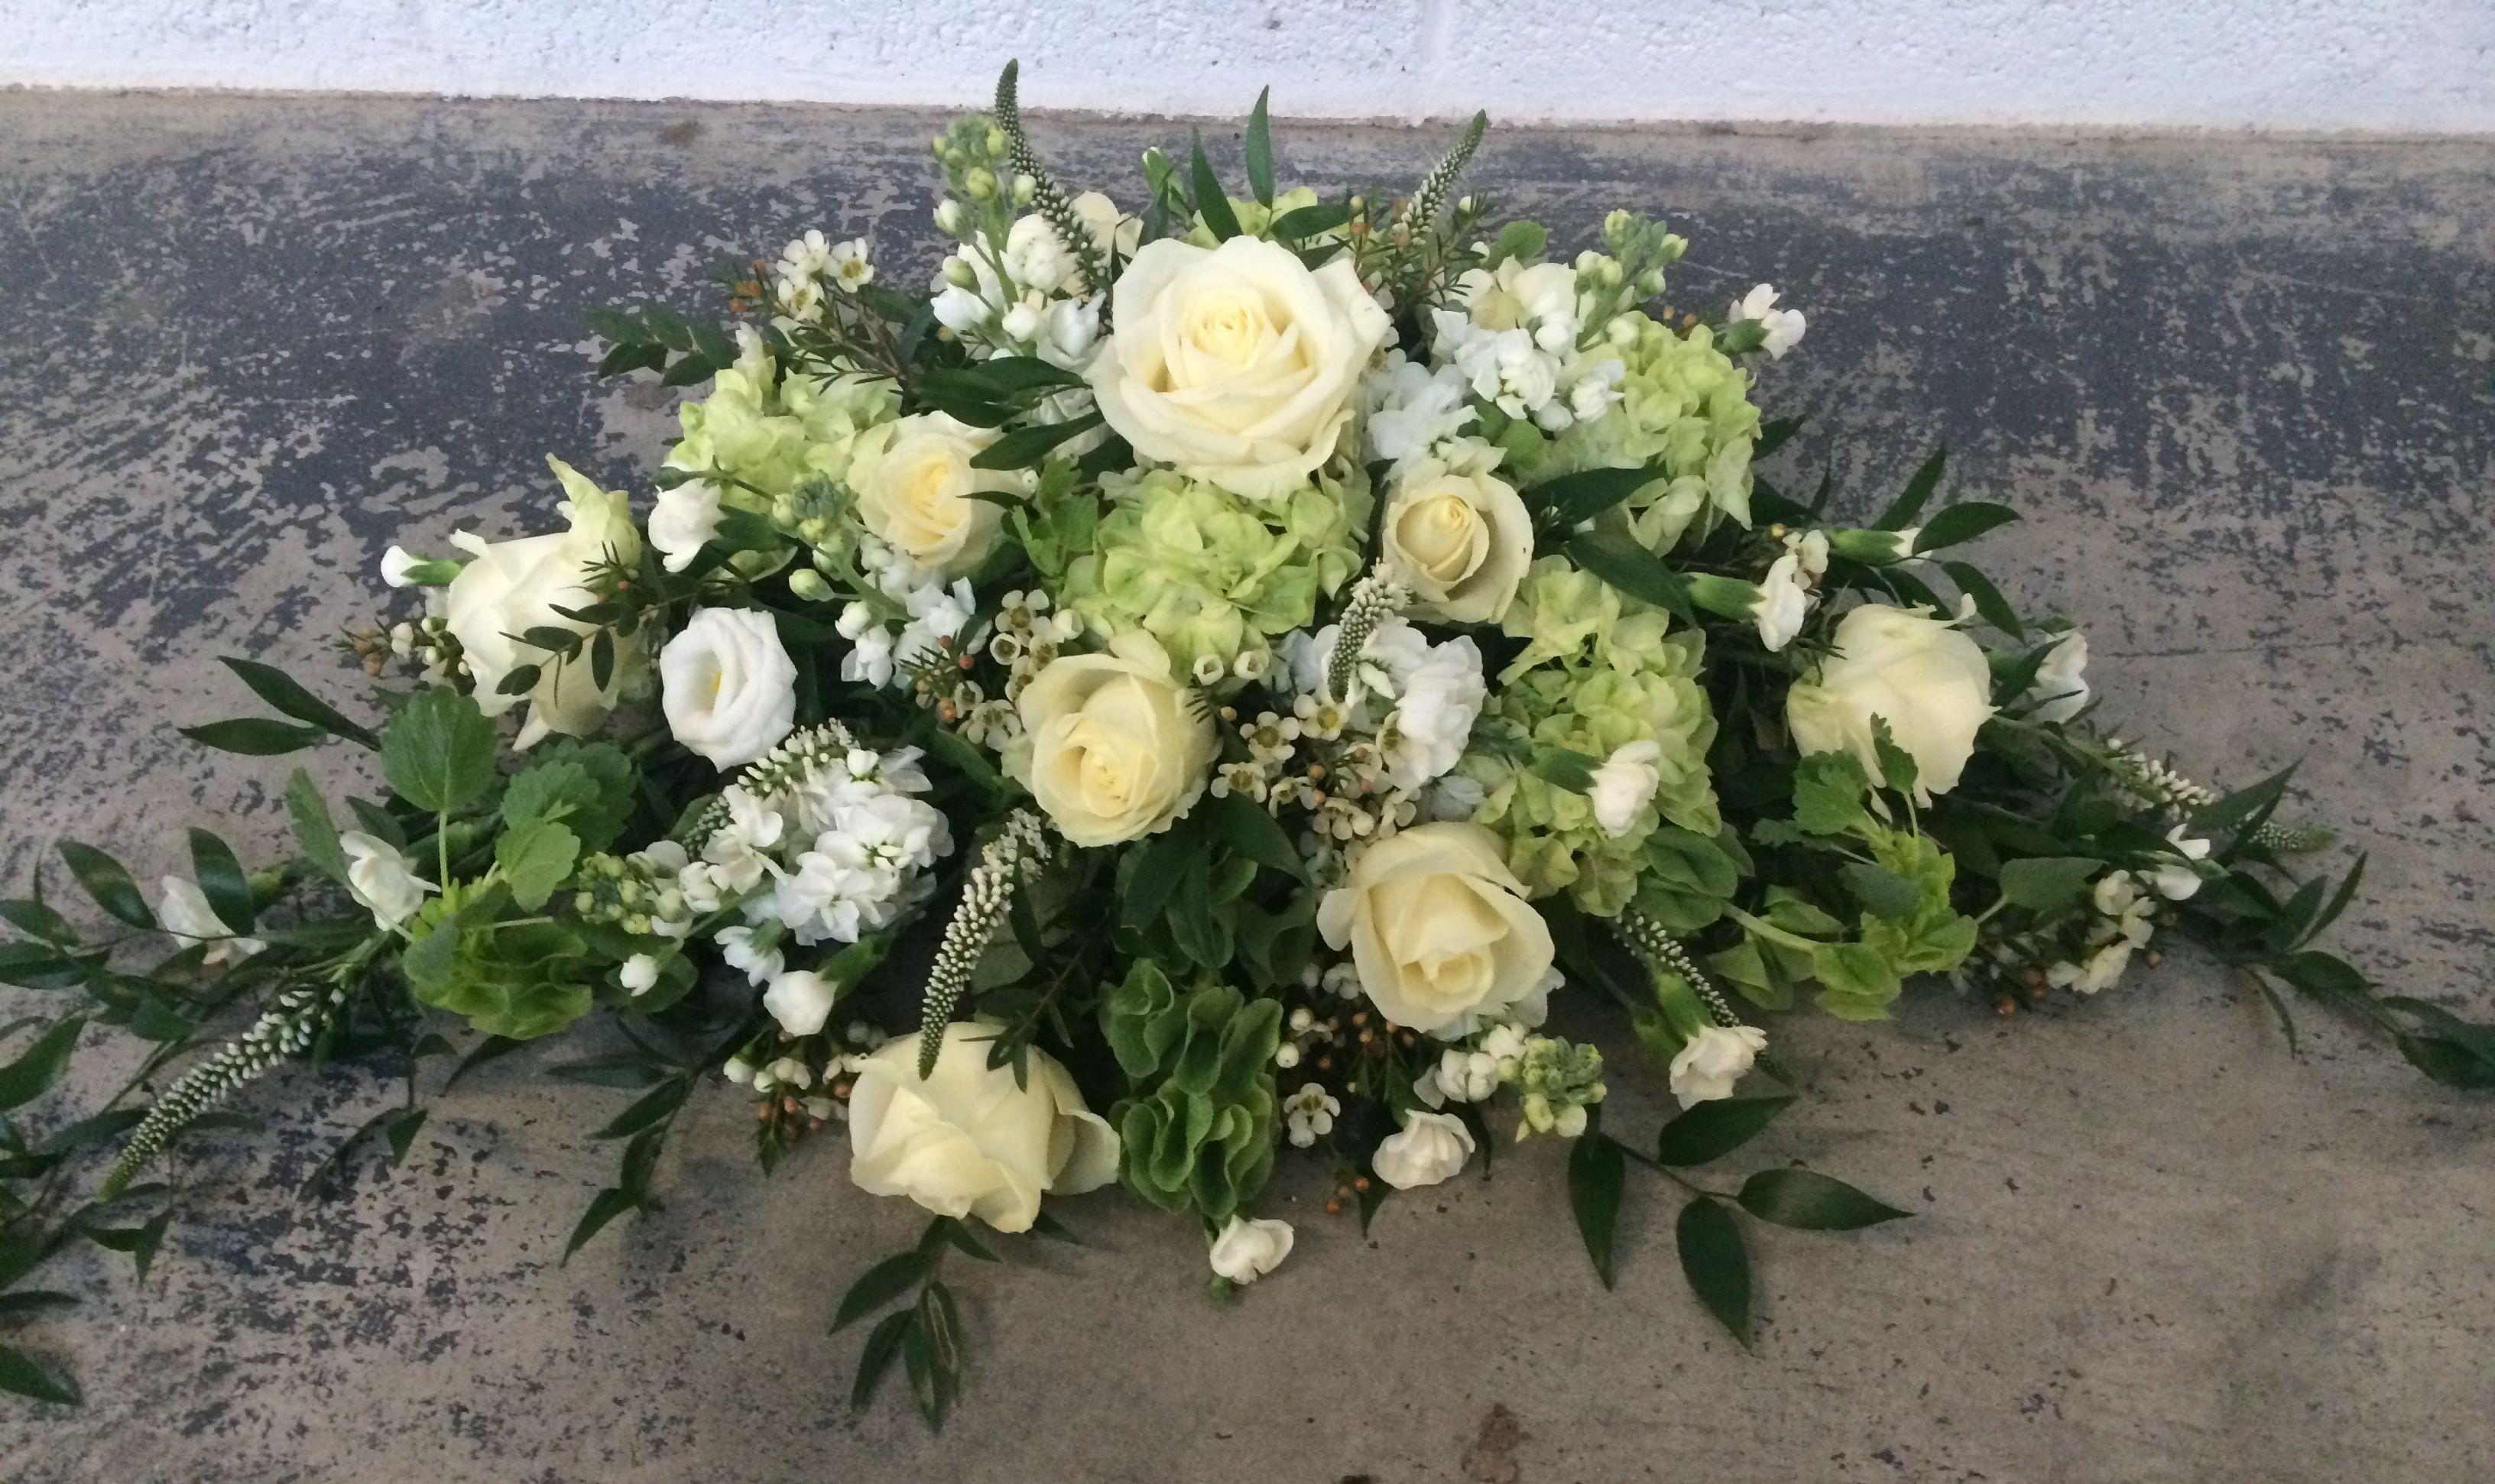 Wedding Flowers, Ceremony Flowers, Top Table, Green Flowers